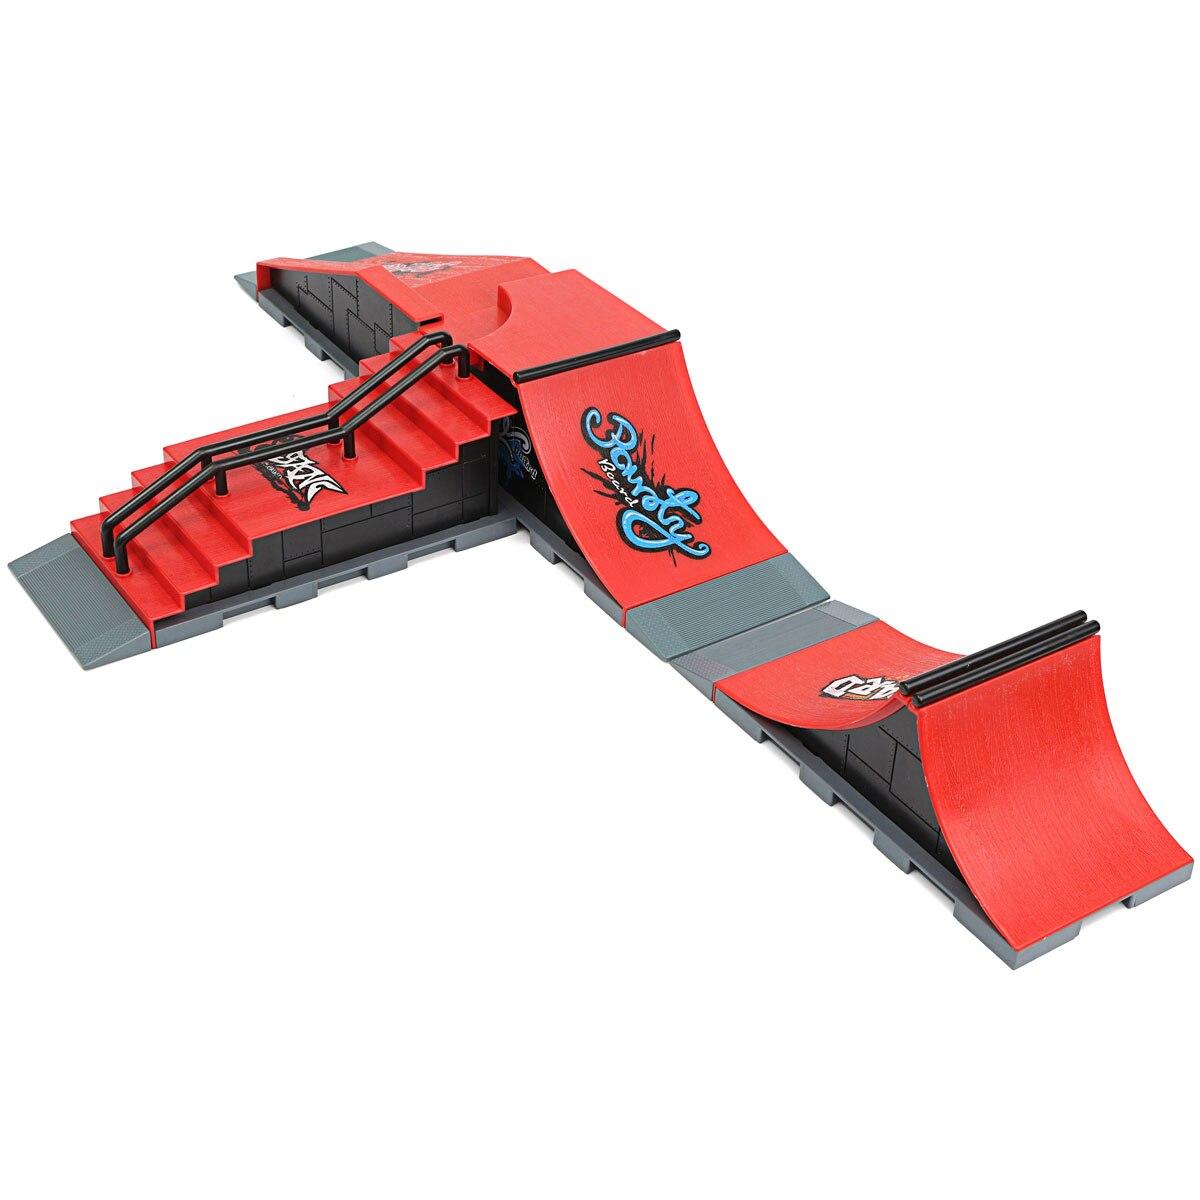 Novelty & Gag Toys Toys & Hobbies Skate Park Ramp Parts For Fingerboard Finger Board Ultimate Parks Ramp f Style